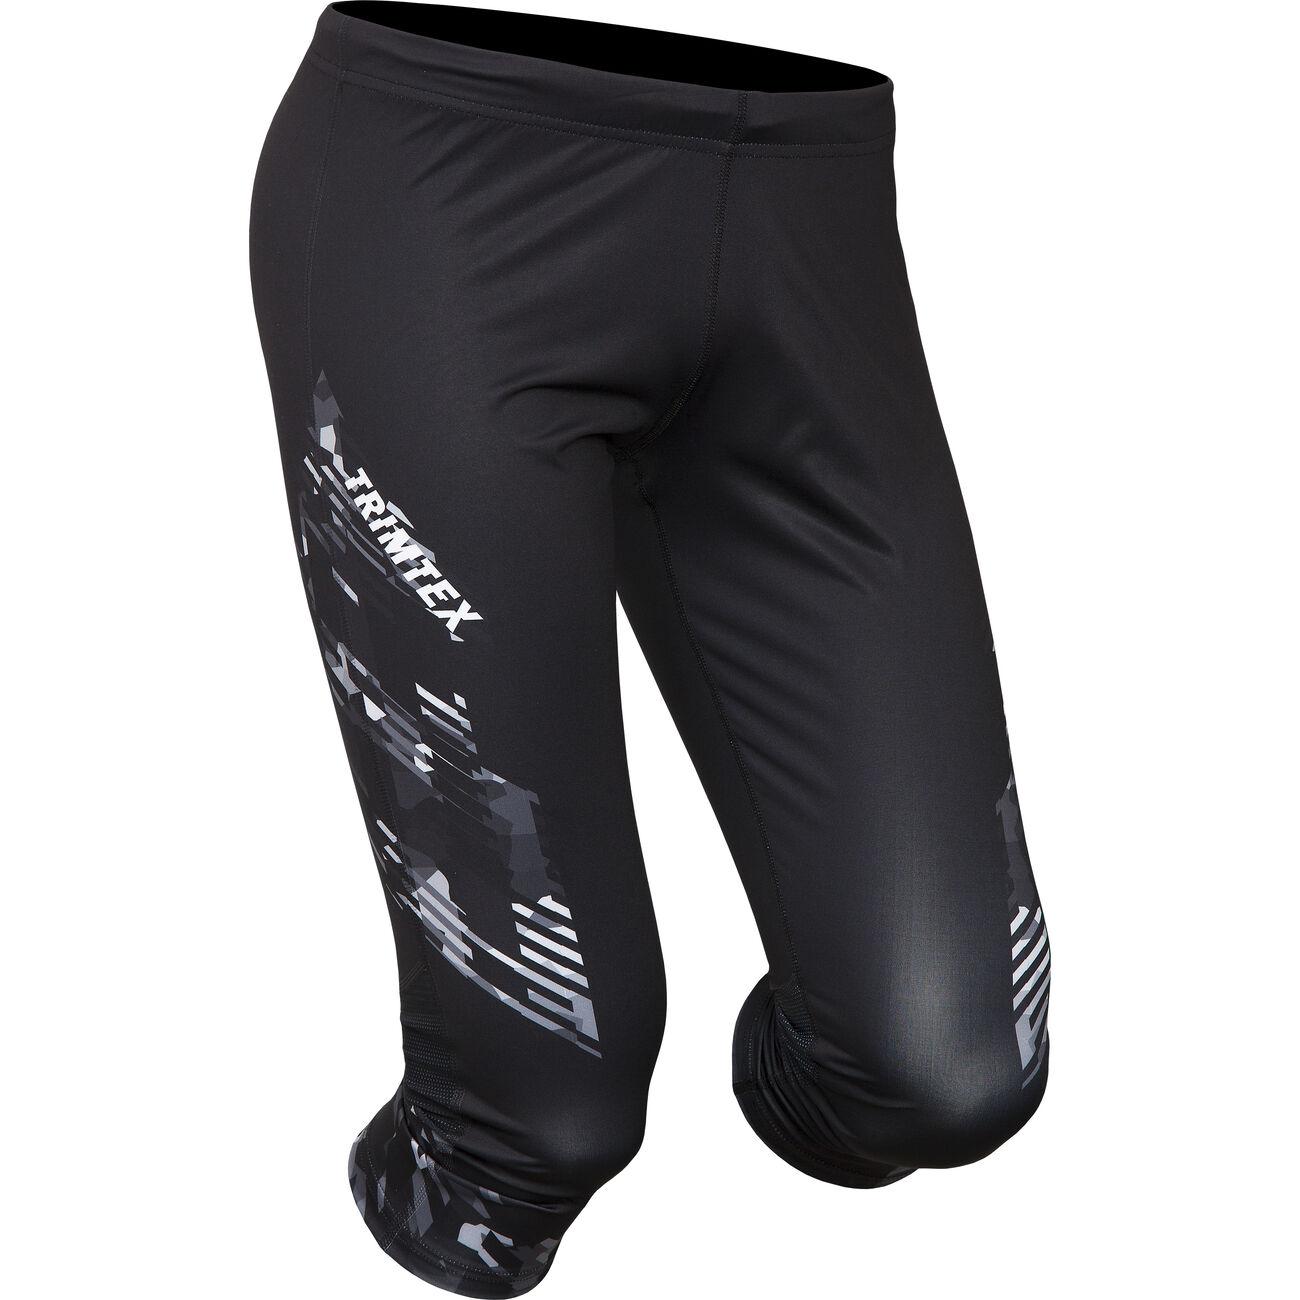 Run 3/4 tights herr - Revised